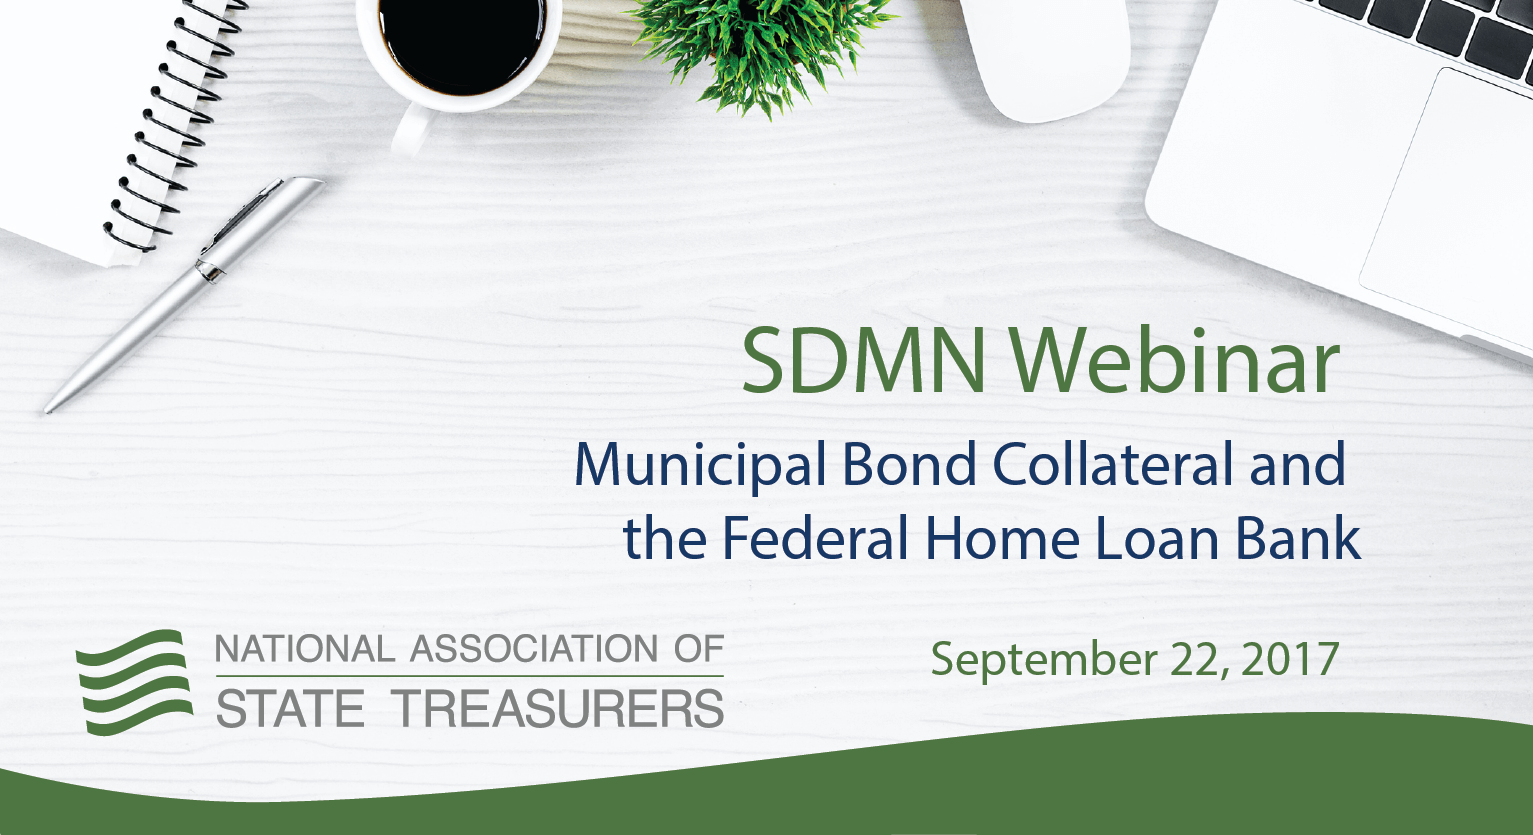 SDMN Webinar - Municipal Bond Collateral